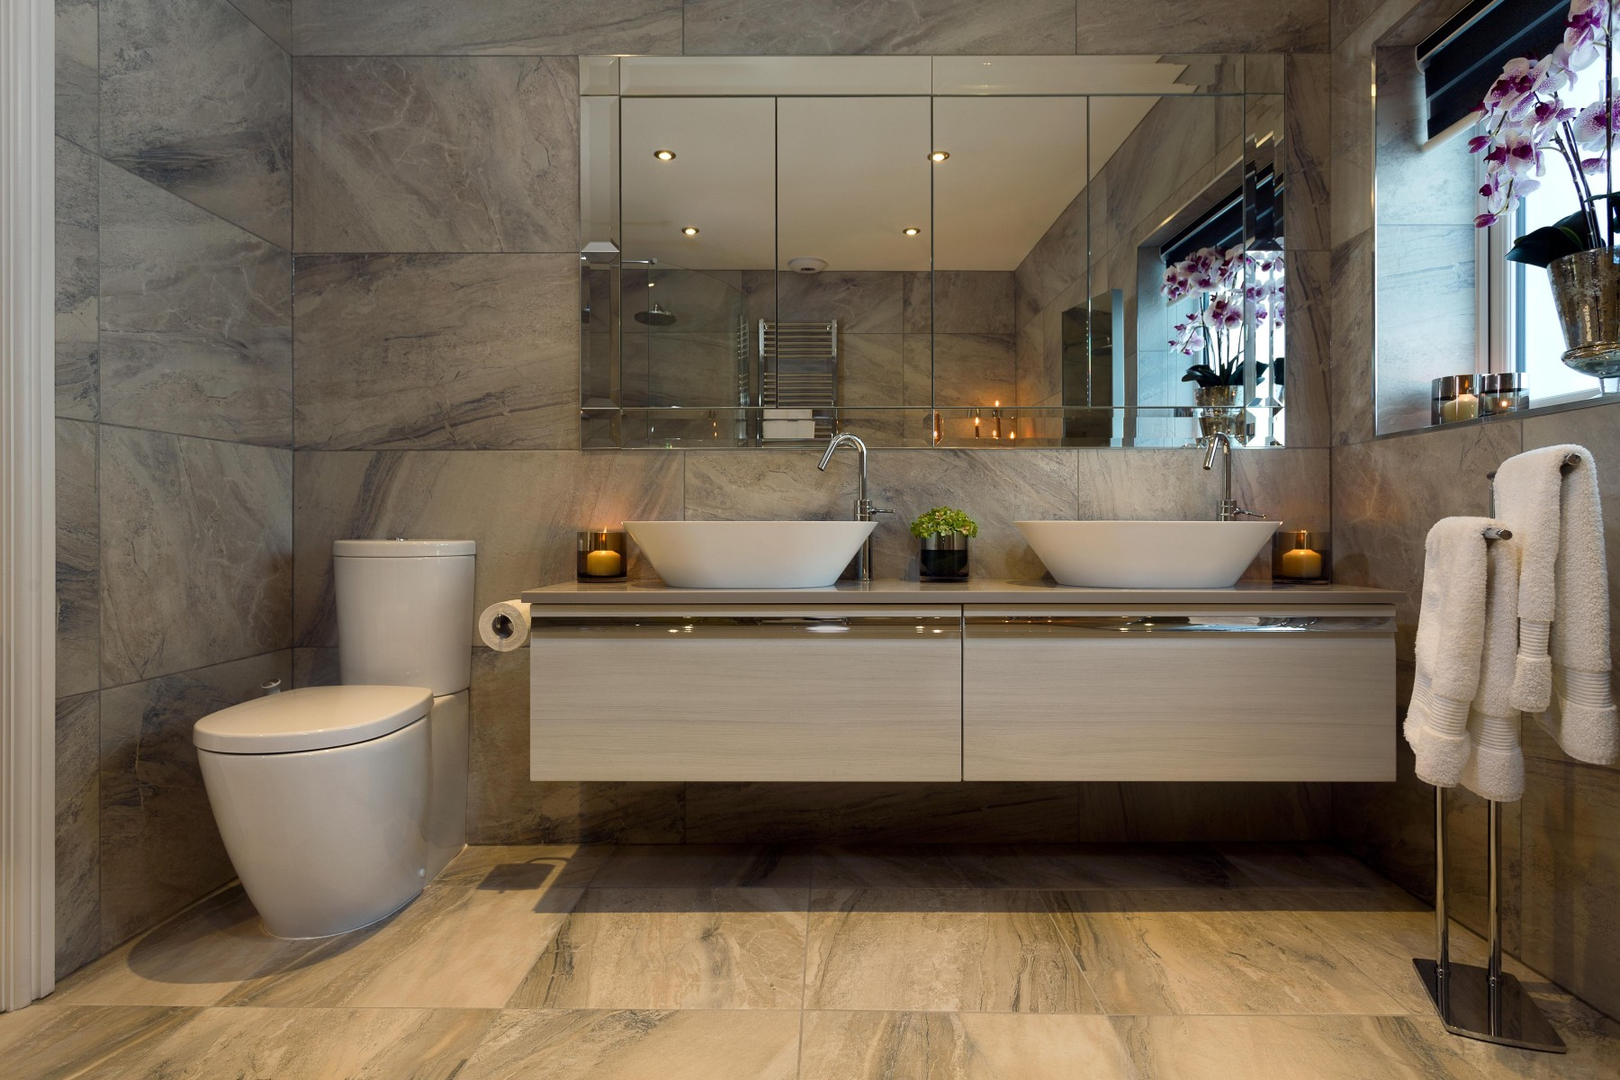 Bathroom cabinet makers - Moko Bespoke Furniture Mbf Bathroom Cabinet Maker And Handmade Furniture Bespoke And Fine Furniture Luxury Interior Design